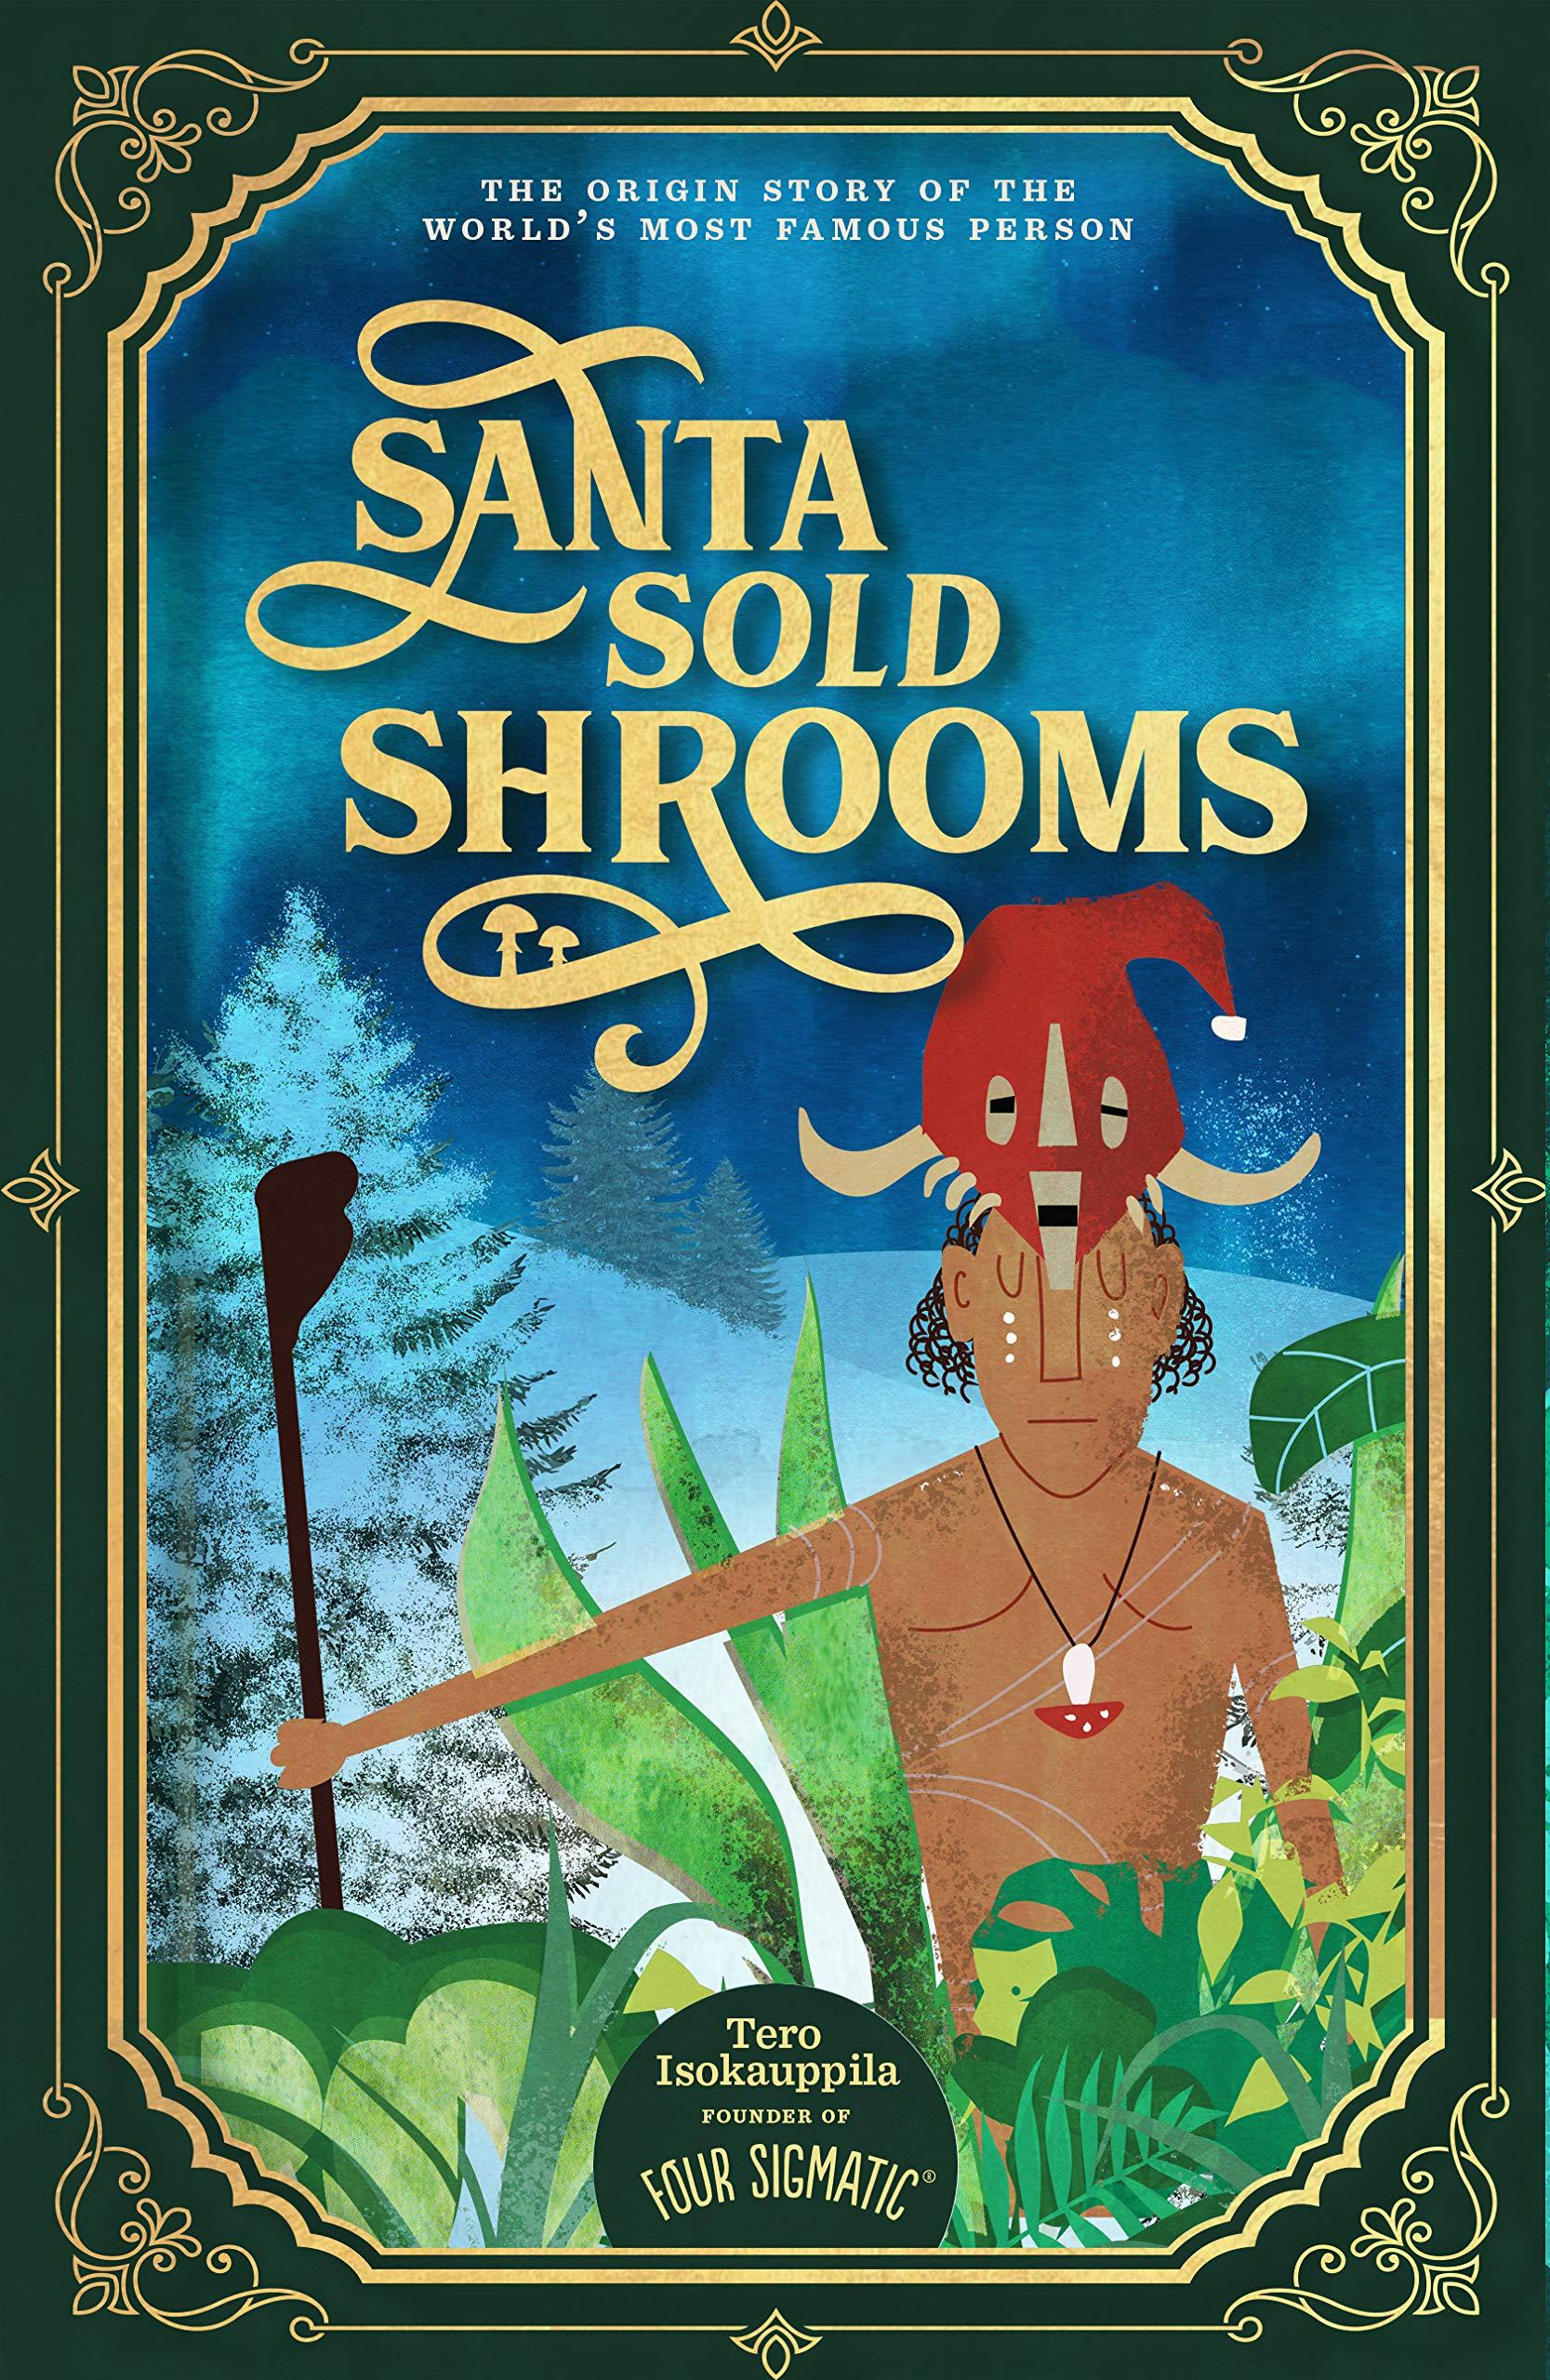 Santa Sold Shrooms Tero Isokauppila Juho Heinola 9780692177310